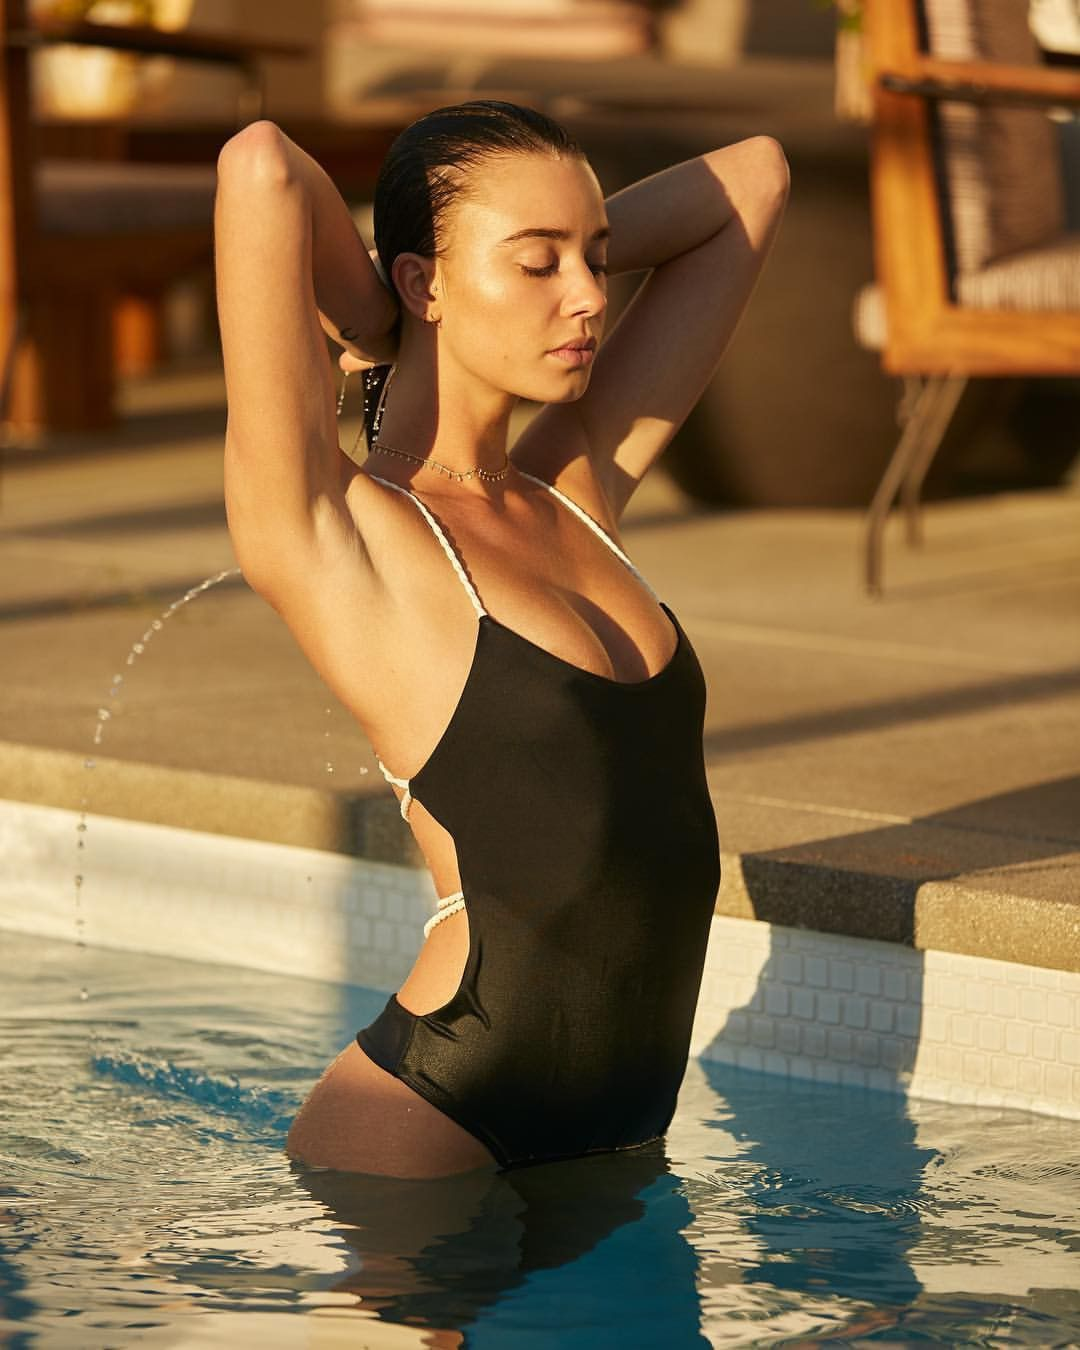 Hot Josey Auguste nudes (18 photos), Tits, Bikini, Instagram, cleavage 2020